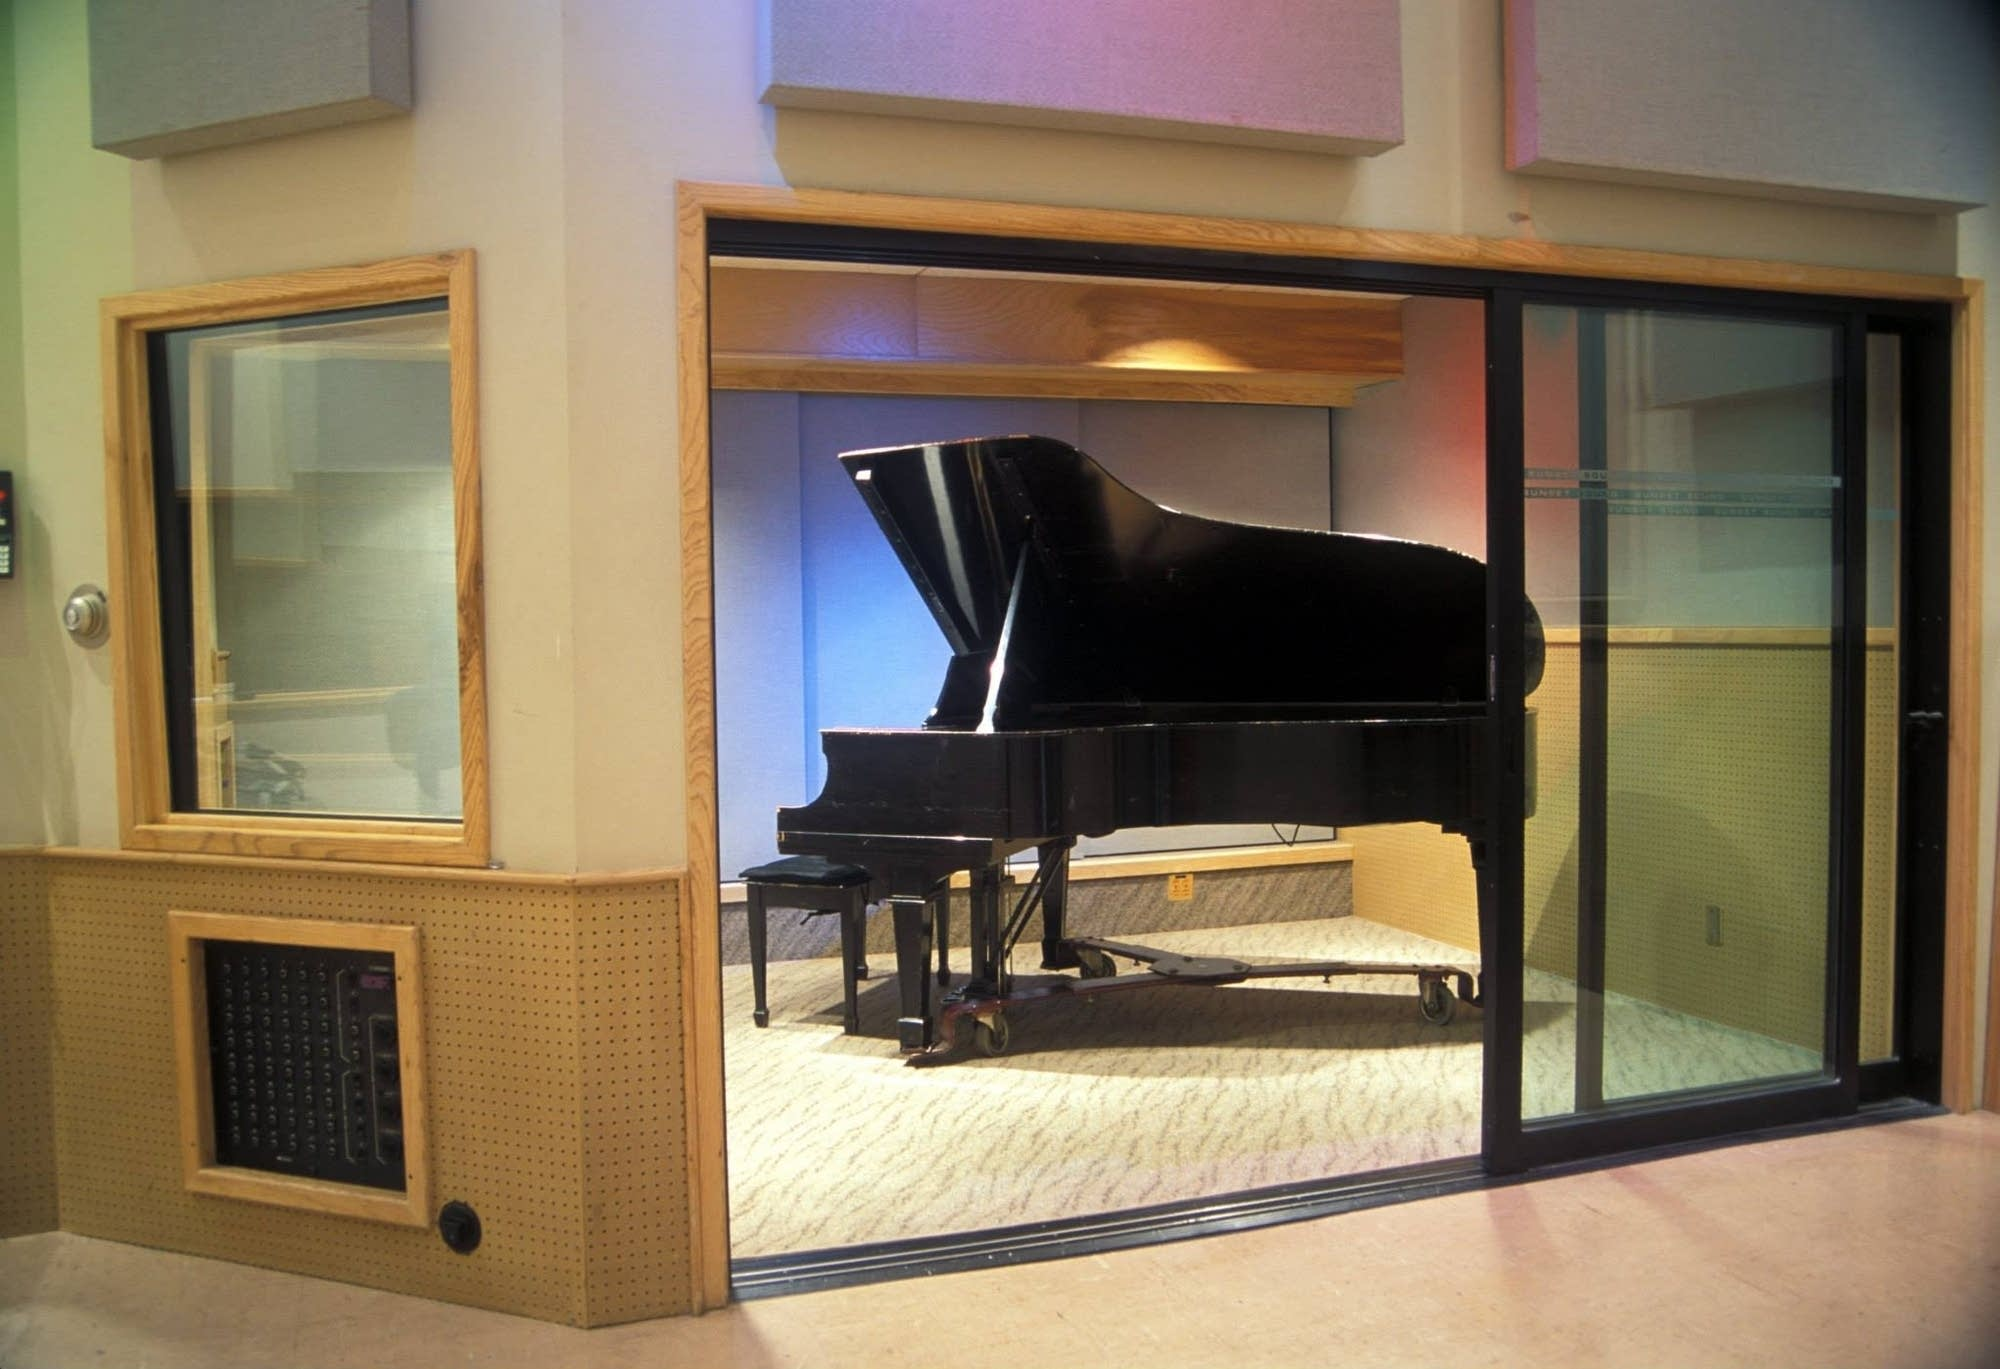 Piano in Sunset Sound studio 2